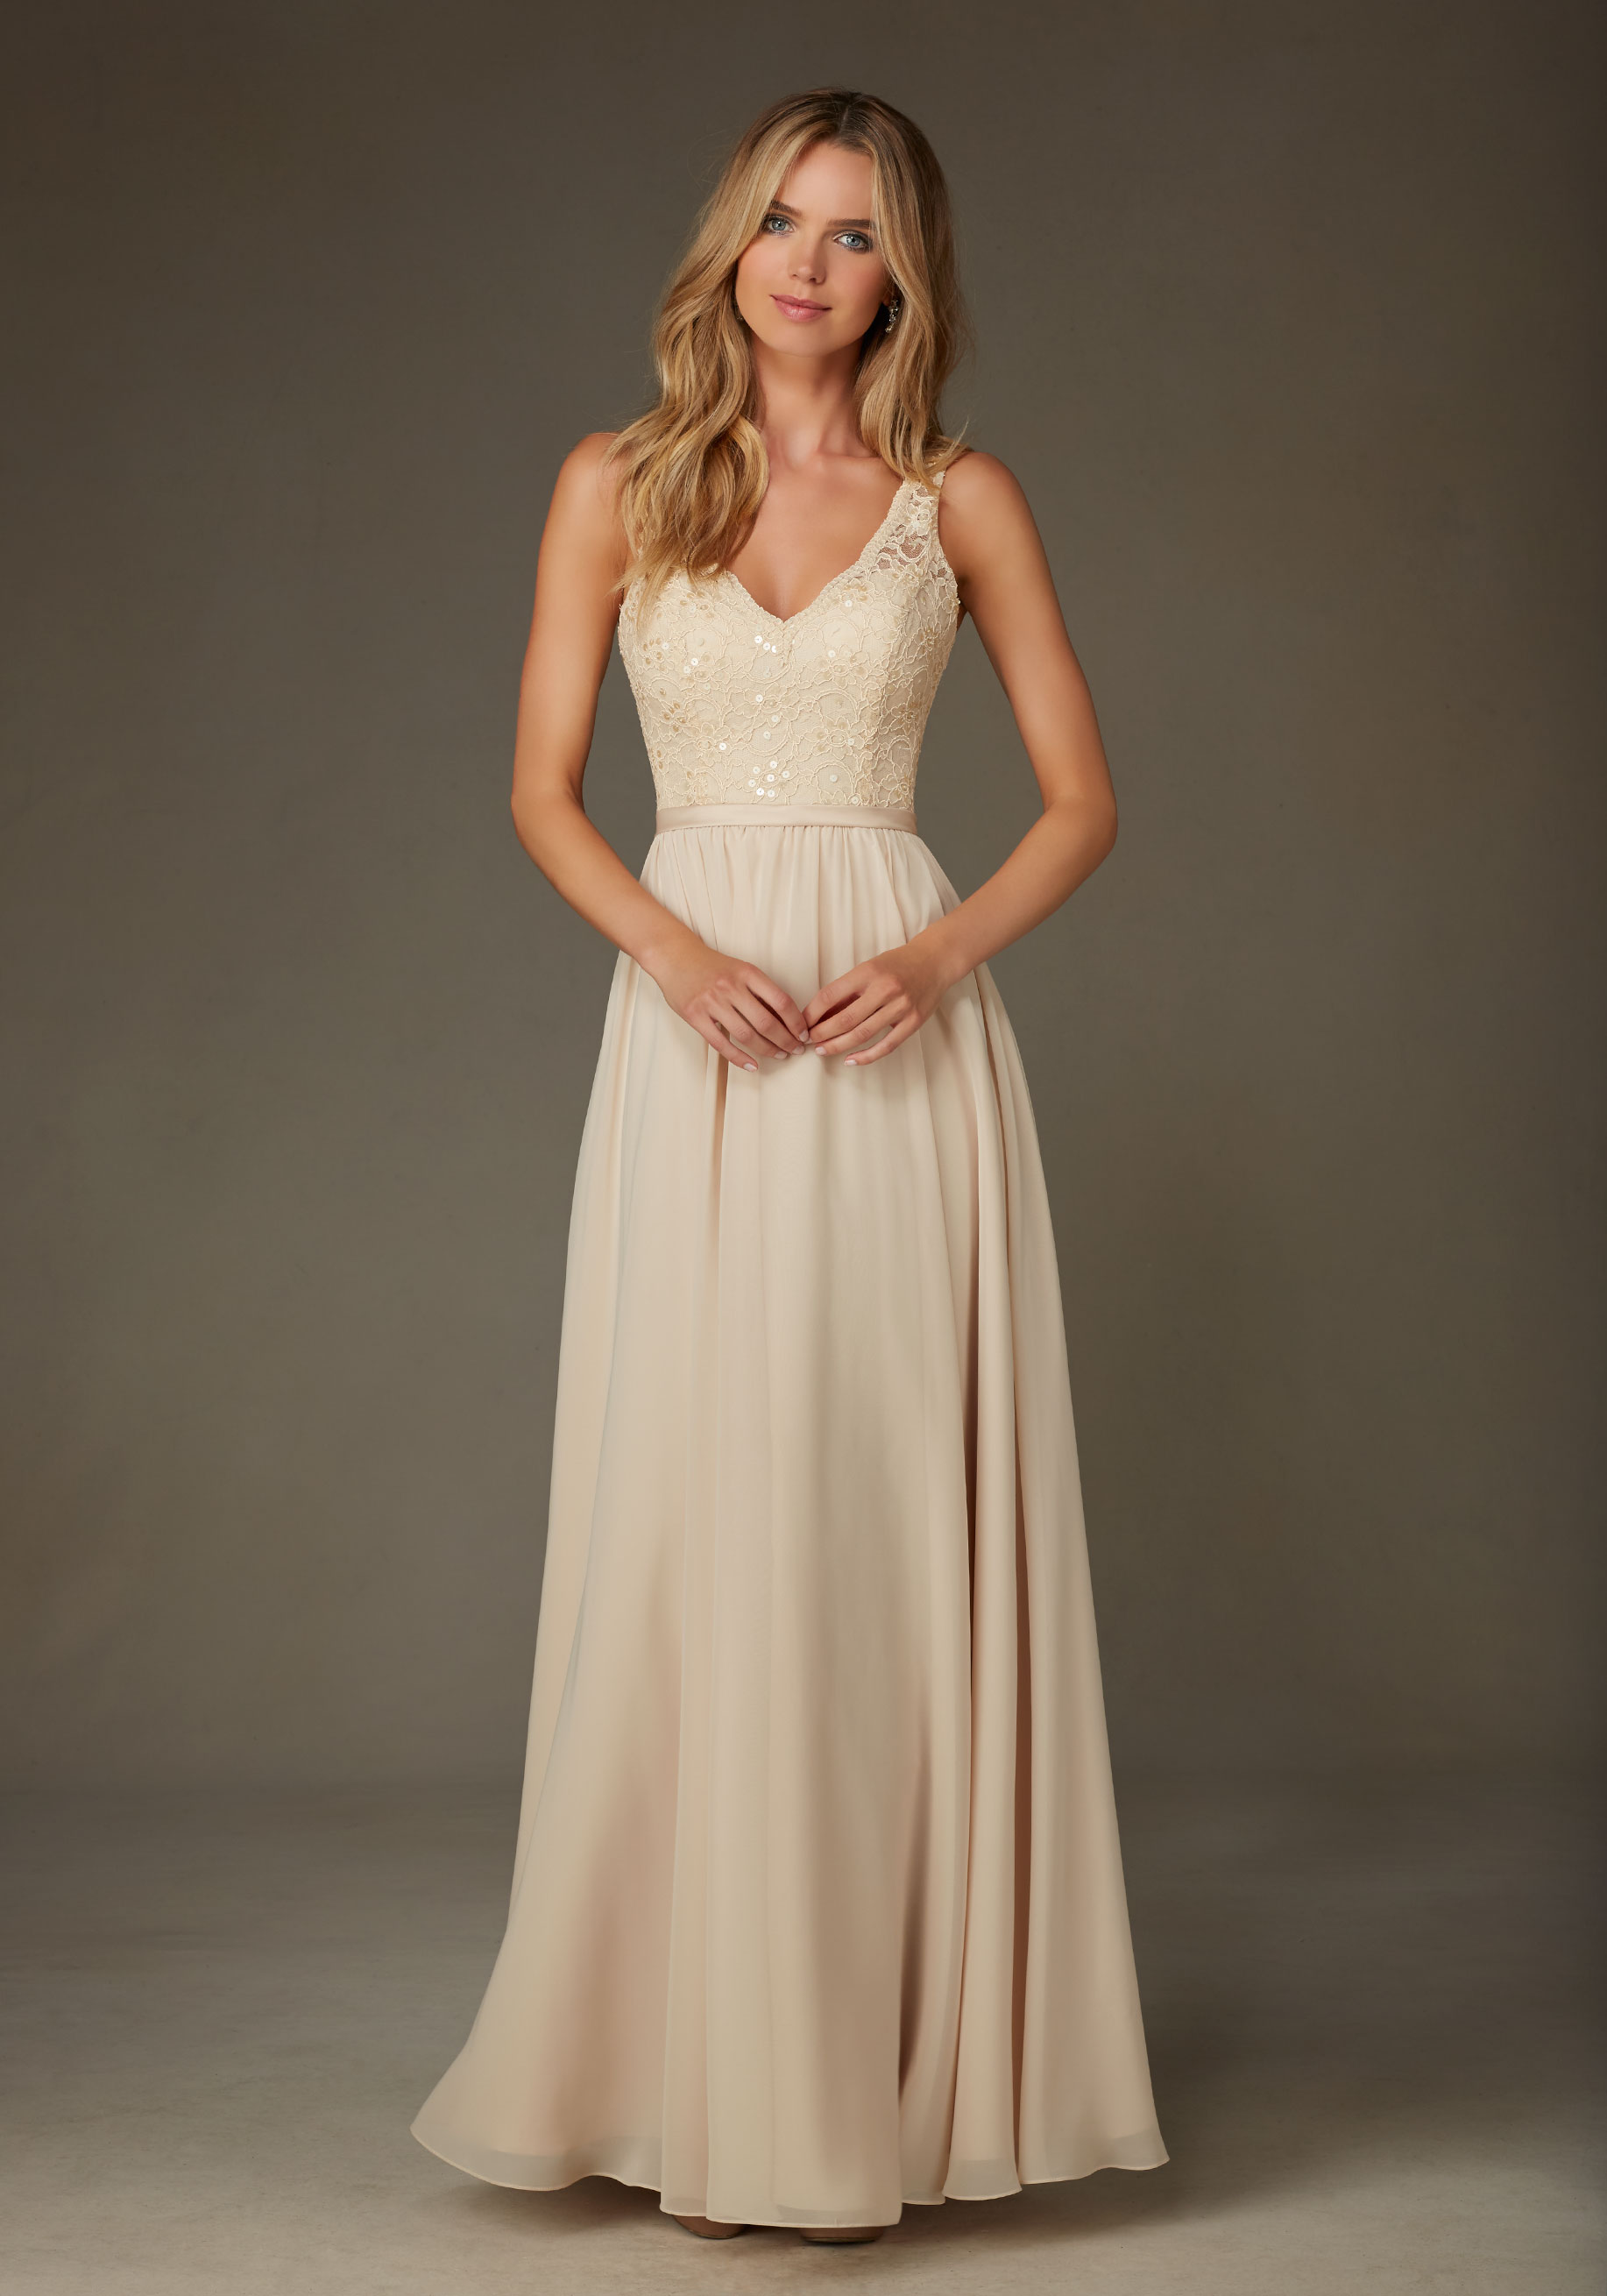 bb1dcf6a7ec Brown Jr Bridesmaid Dresses - Data Dynamic AG